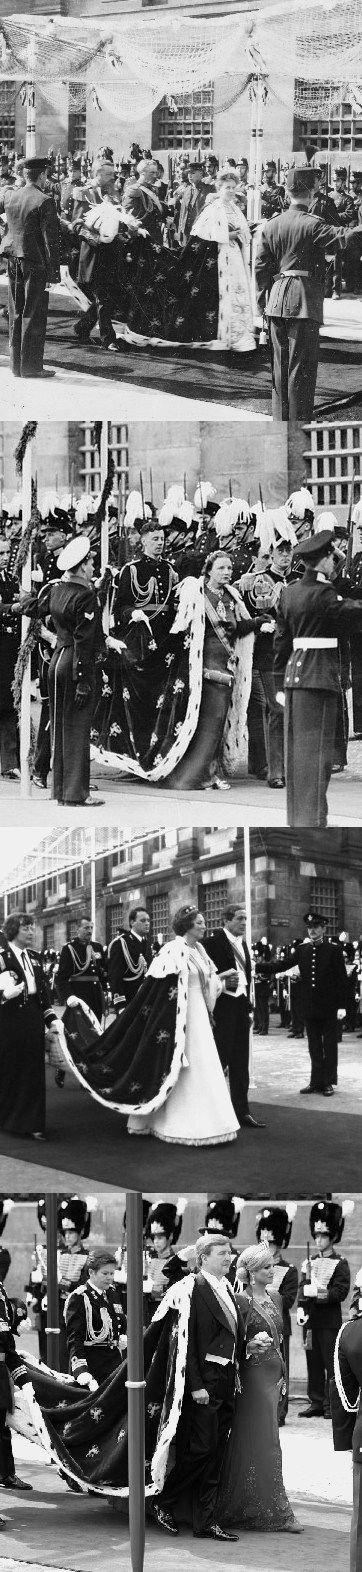 Inhuldiging Koningin Wilhelmina 1898 | Koningin Juliana 1948 | Koningin Beatrix 1980 | Koning Willem Alexander 2013